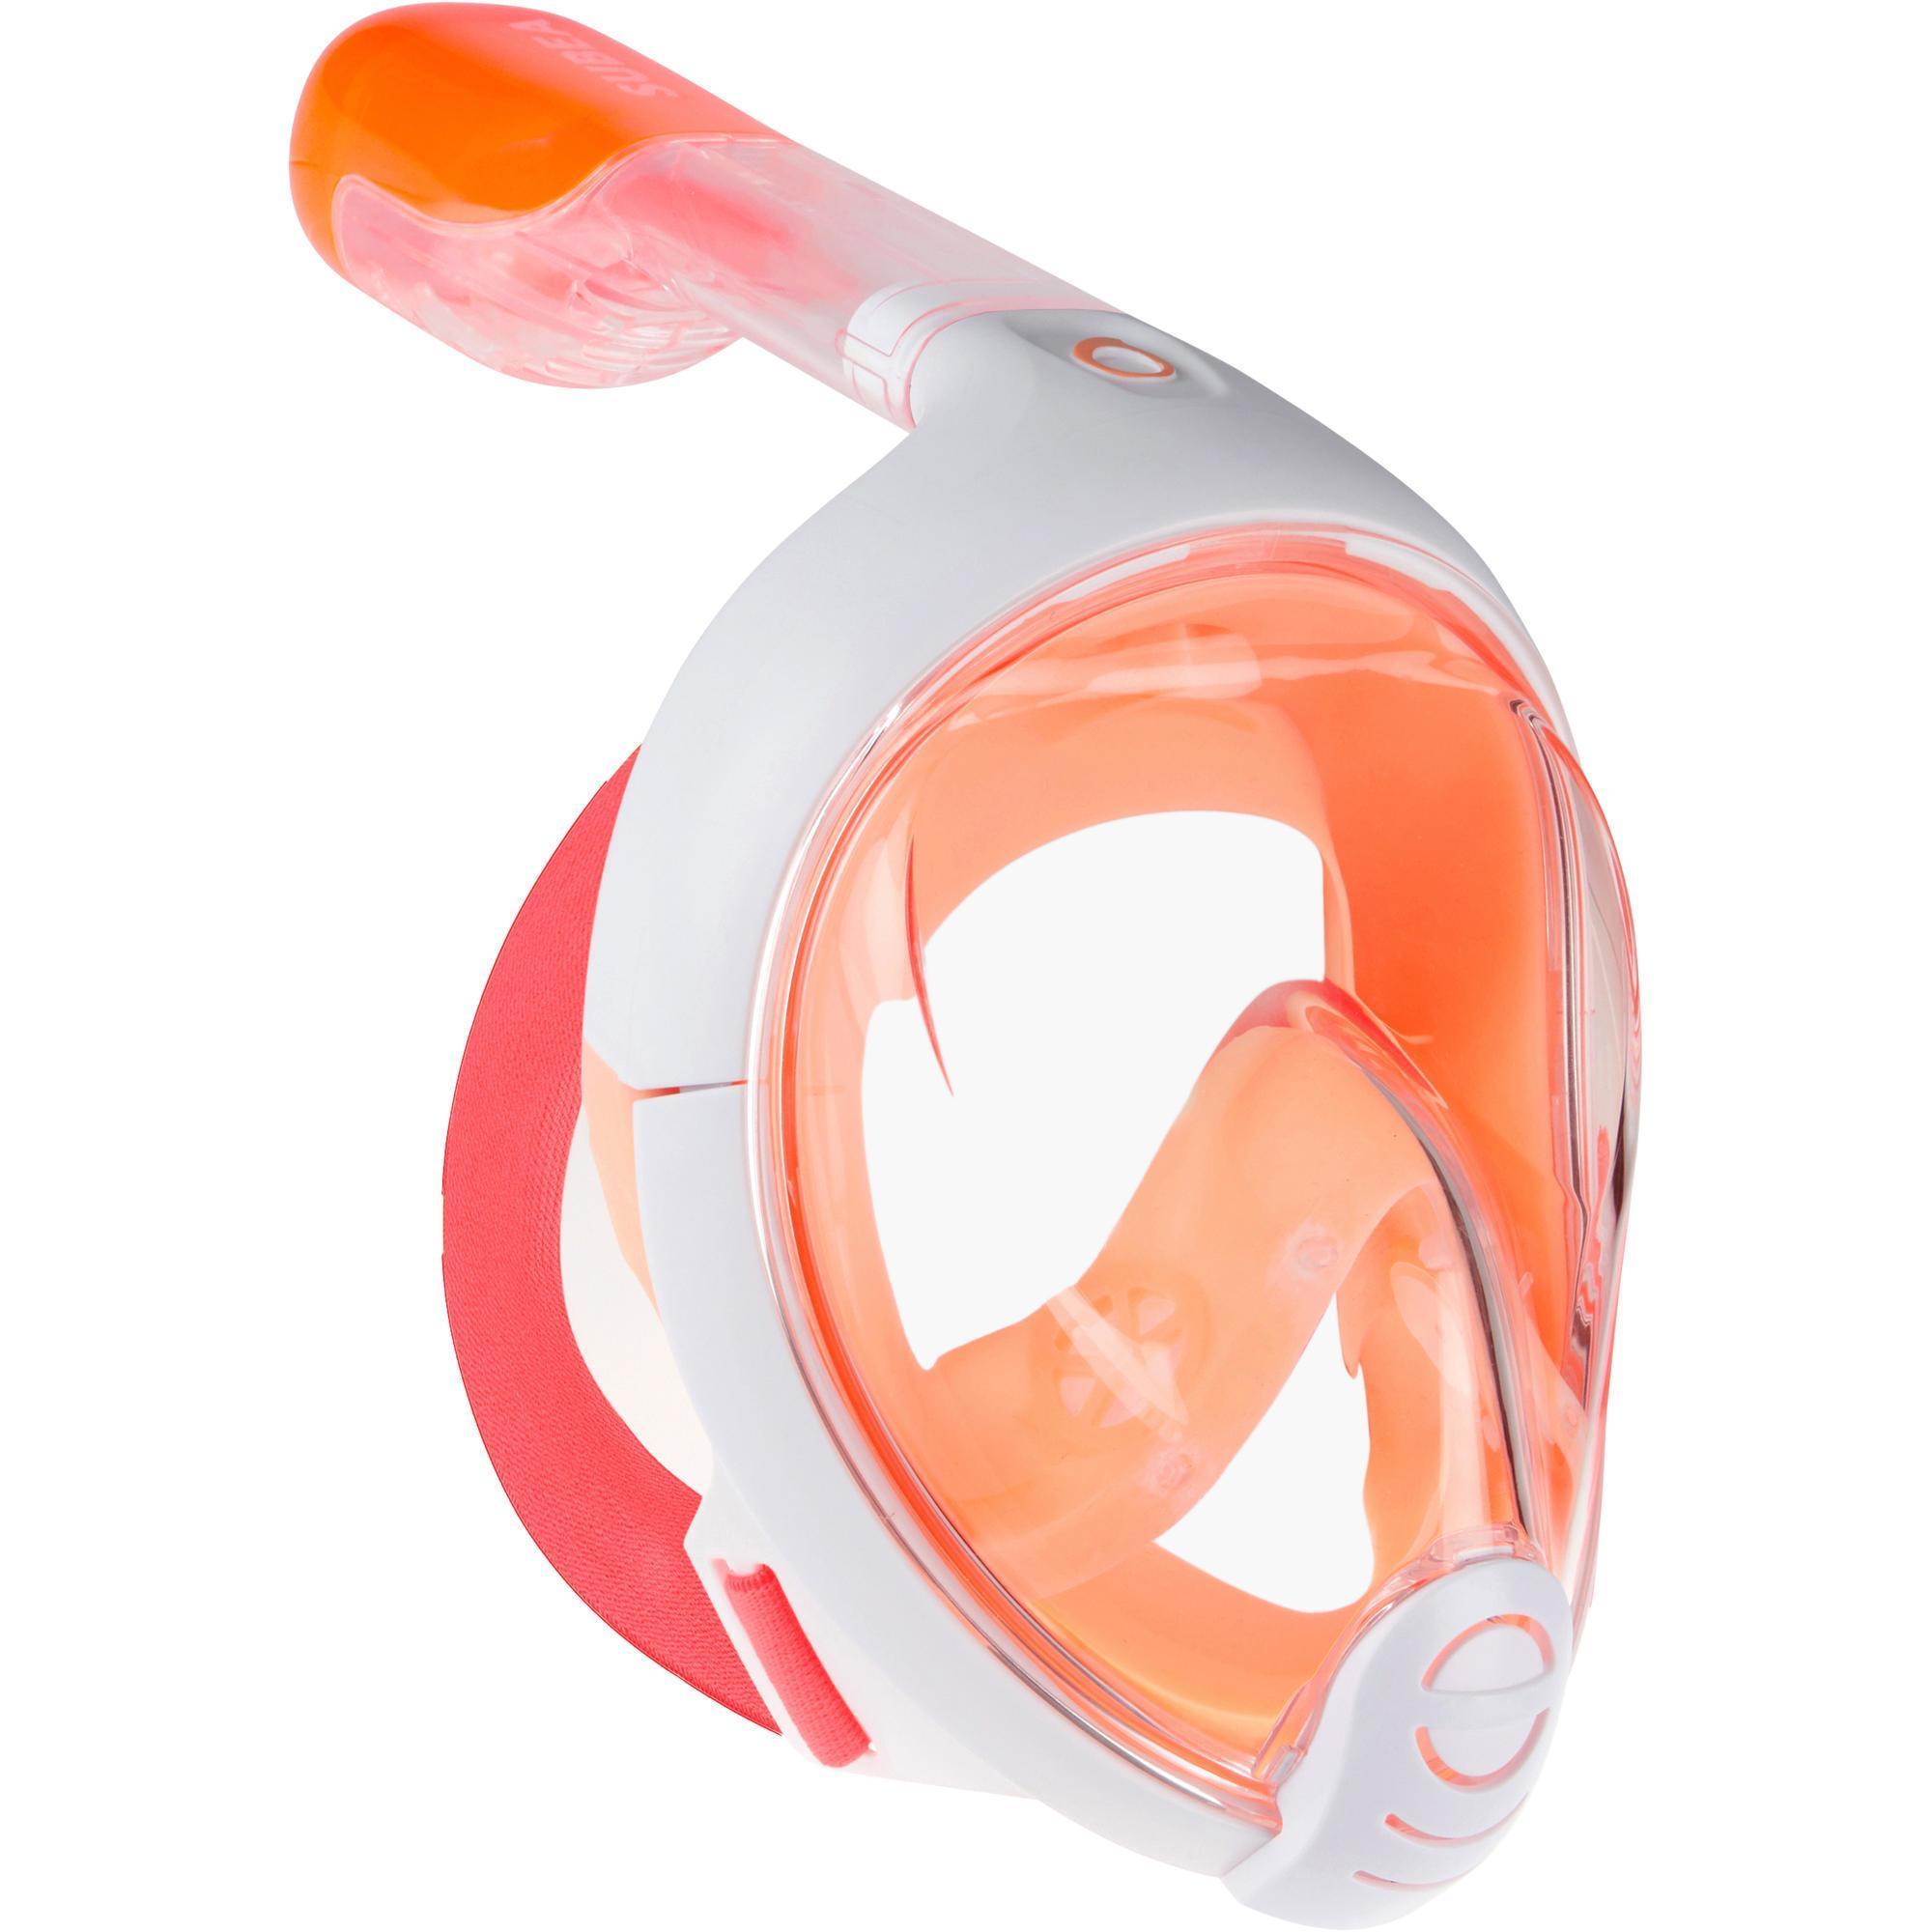 Subea Snorkelmasker Easybreath Junior kind (6-10 jaar) oranje roze